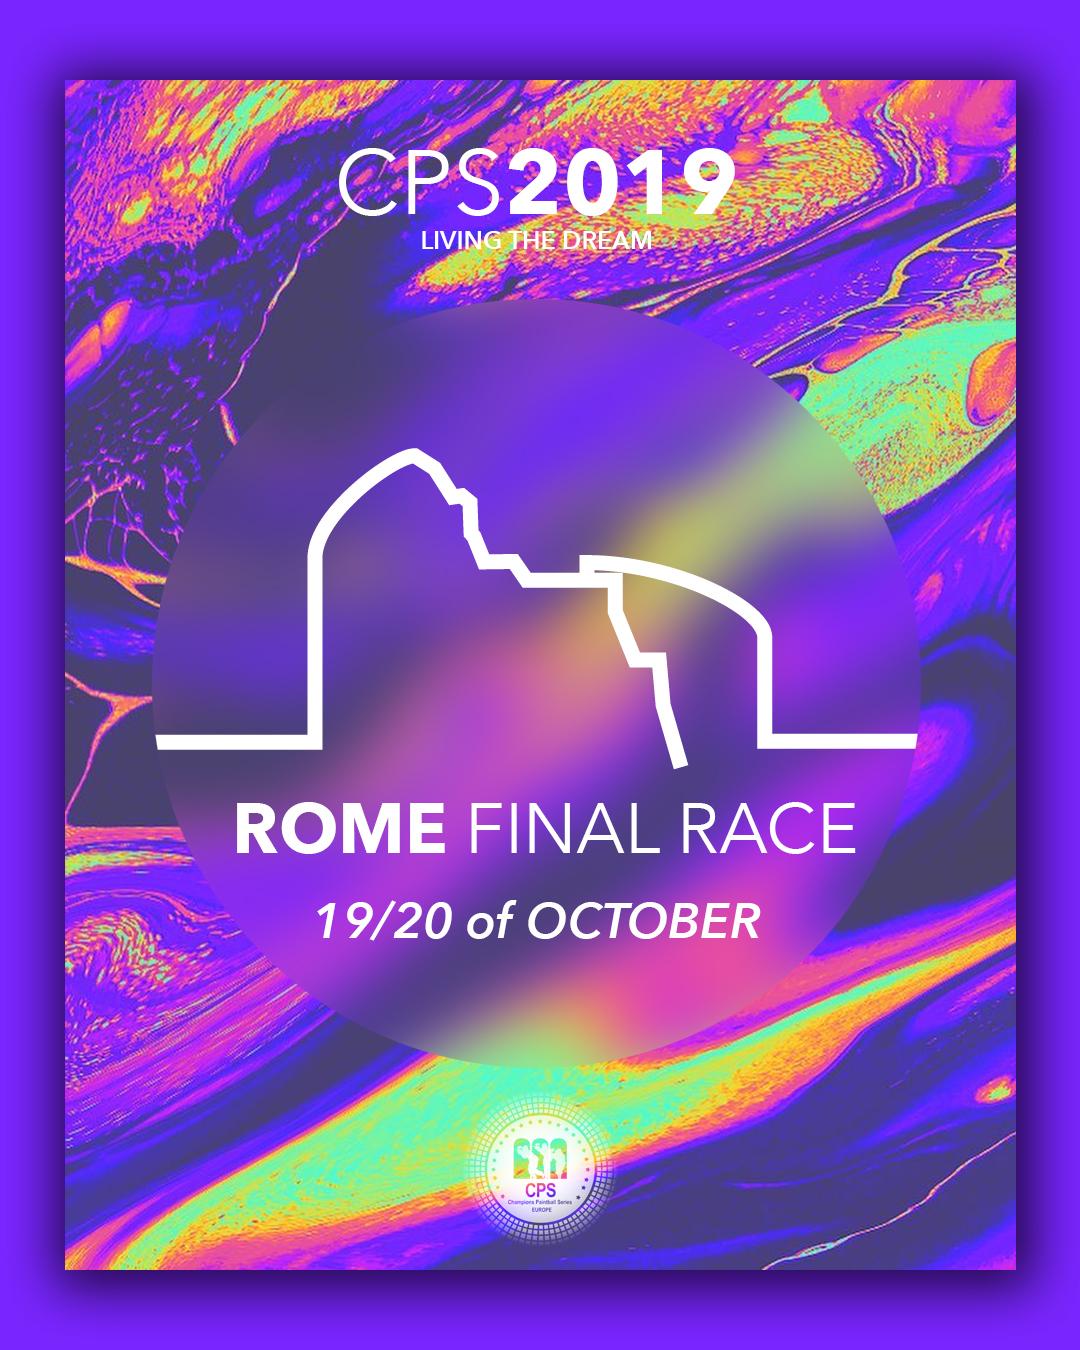 rome final race